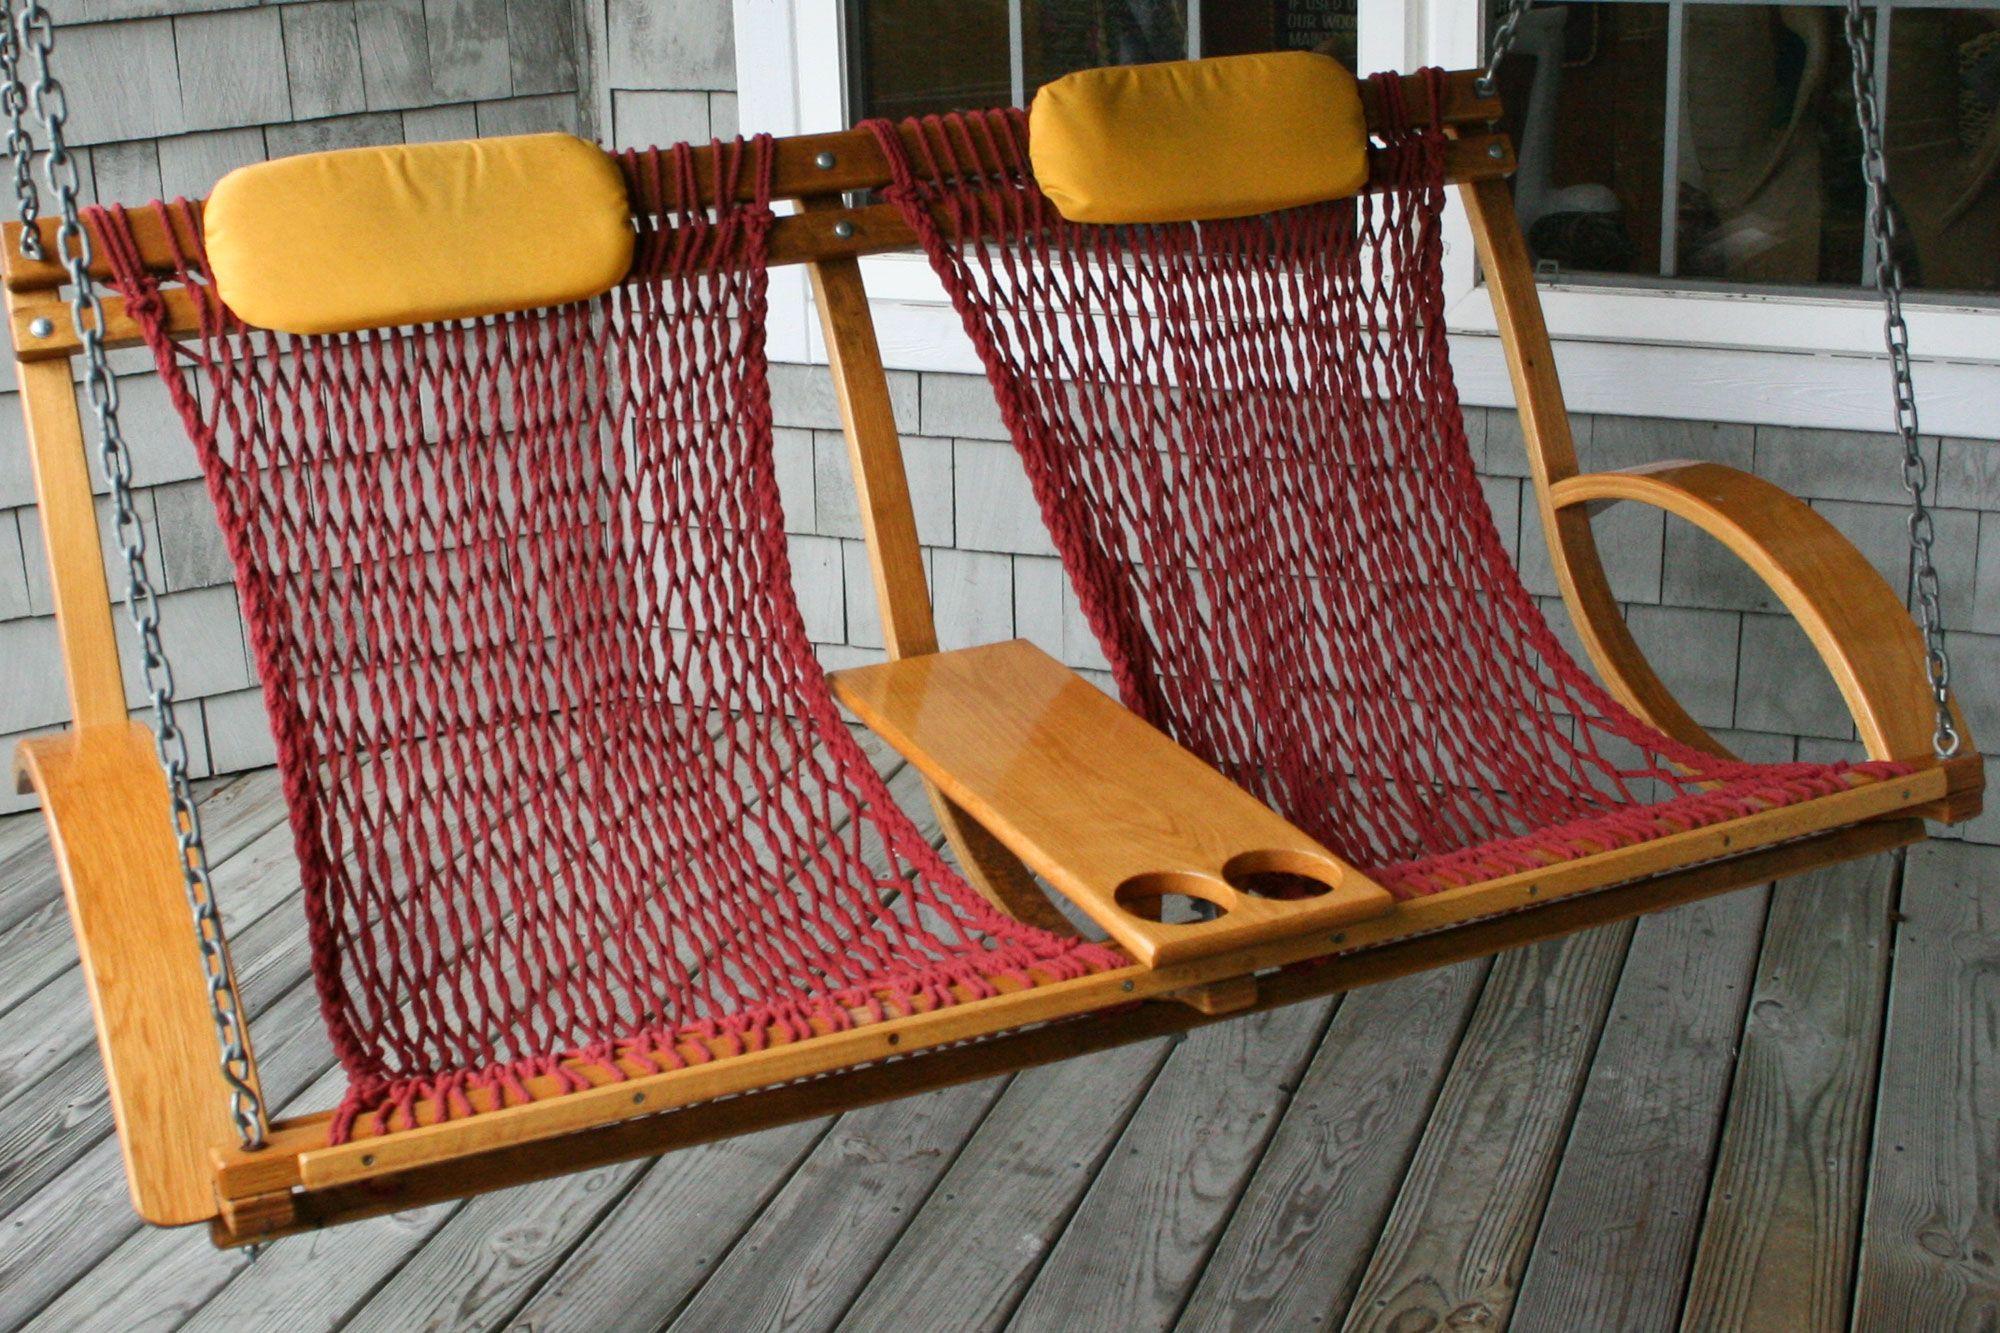 Porch Swing By Nags Head Hammocks